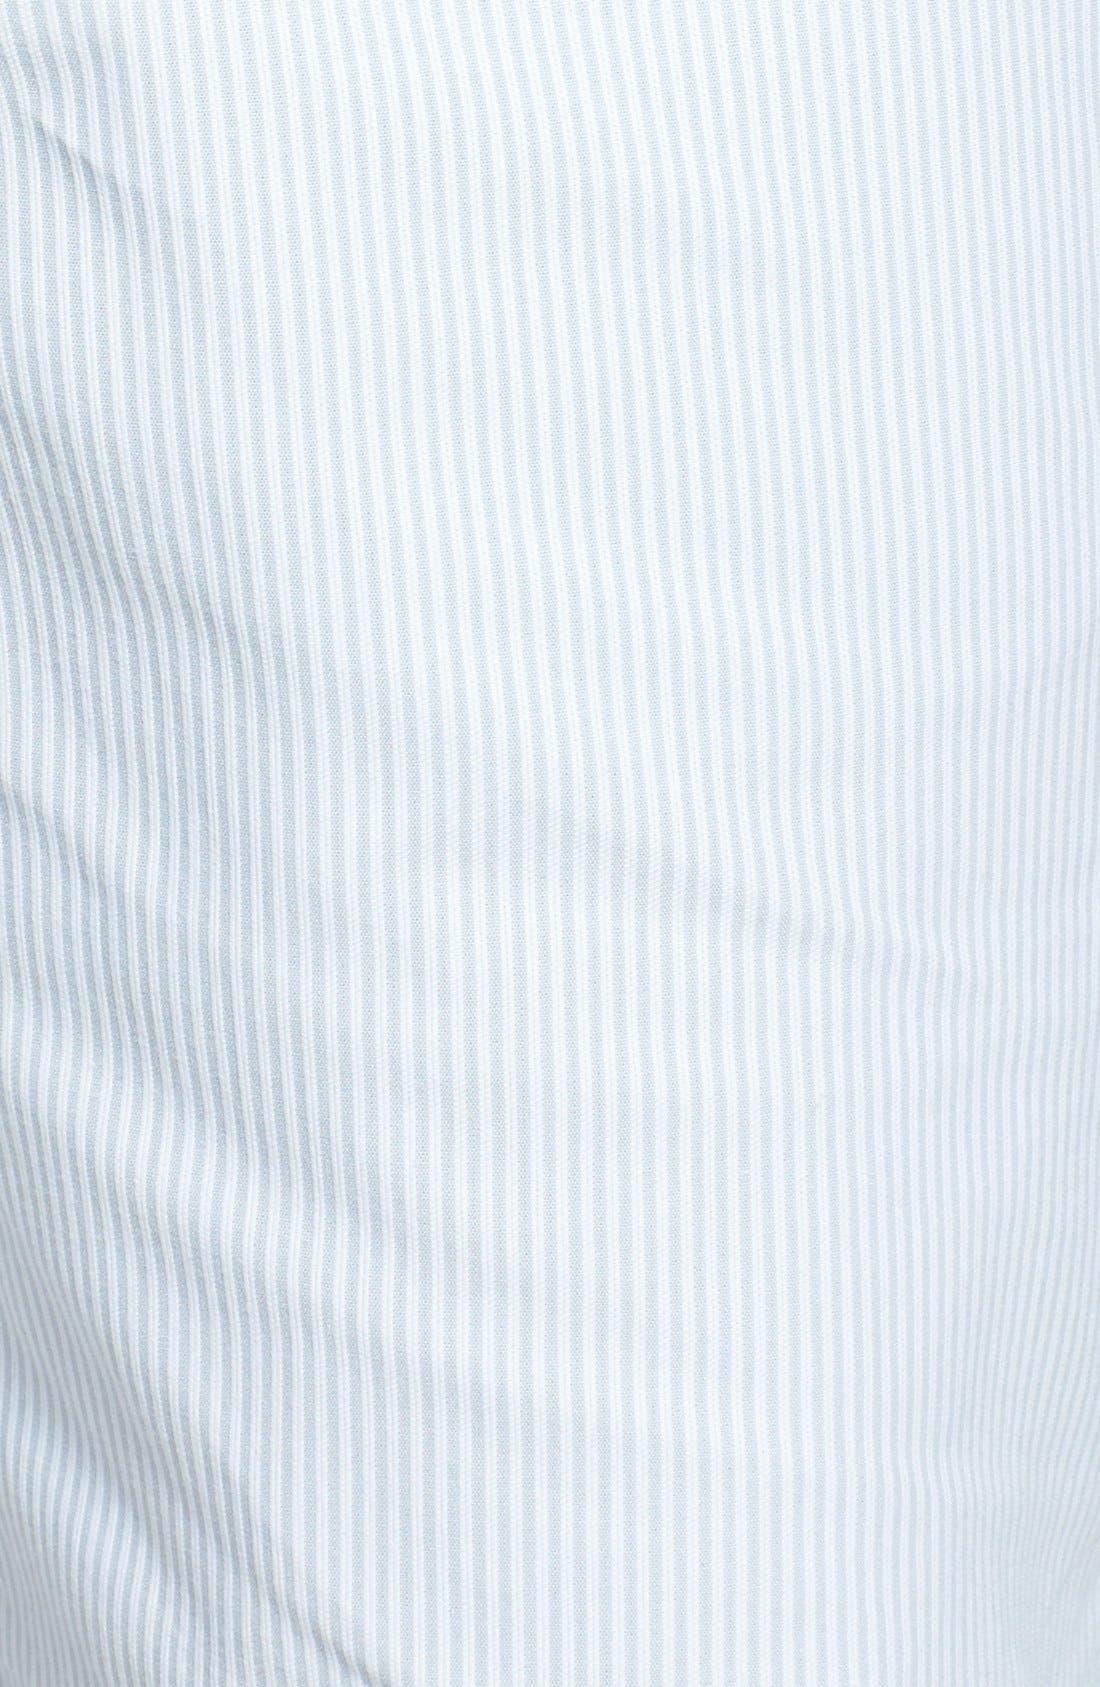 Alternate Image 3  - Original Penguin Tailored Stripe Trouser Shorts